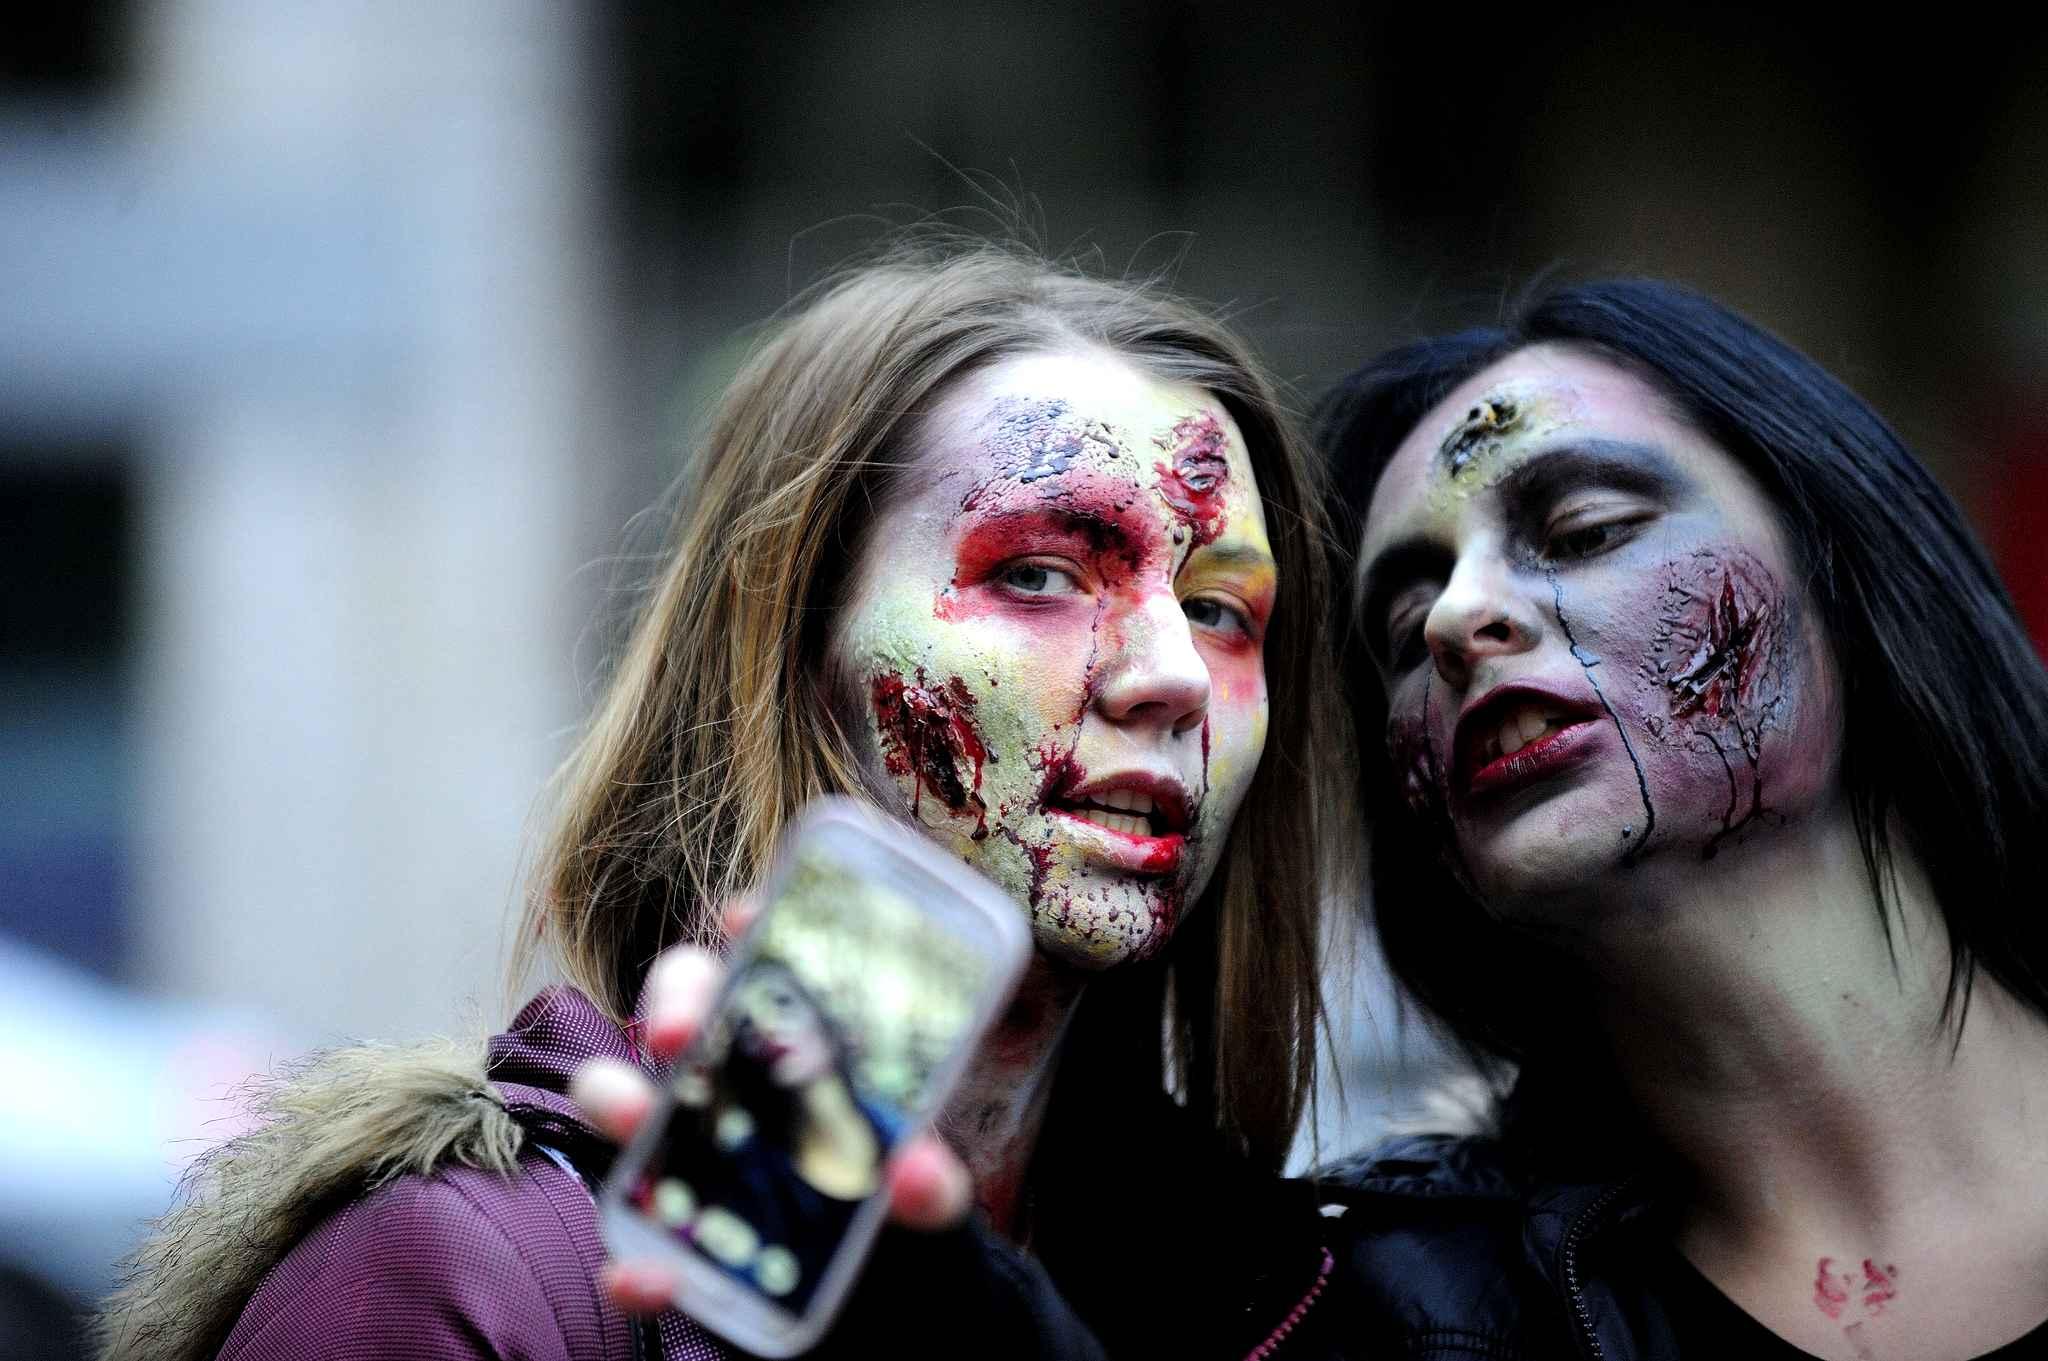 время картинки про зомби в жизни вашему